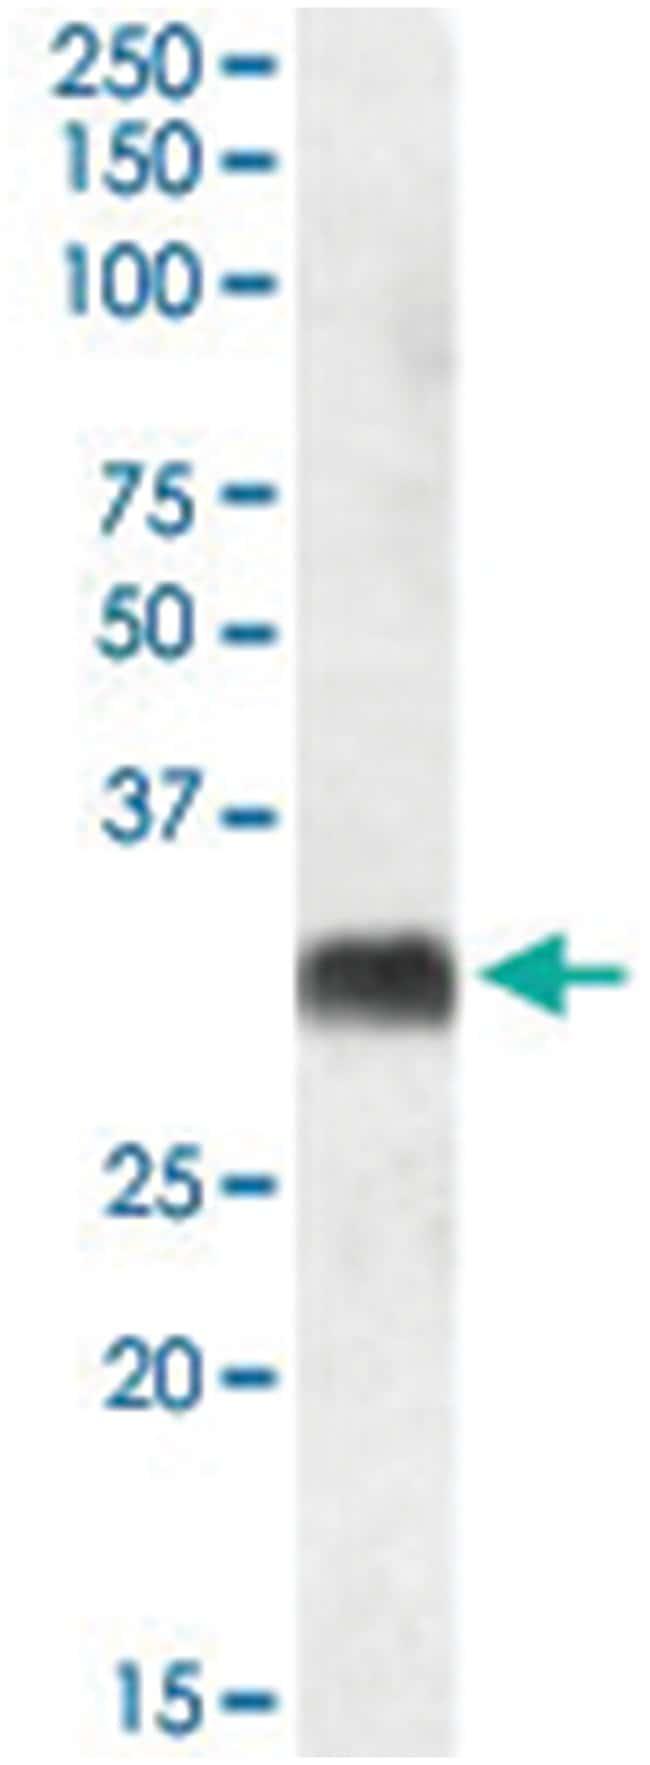 SRD5A2 Goat anti-Human, Polyclonal Antibody, Abnova 100µg; Unlabeled:Life